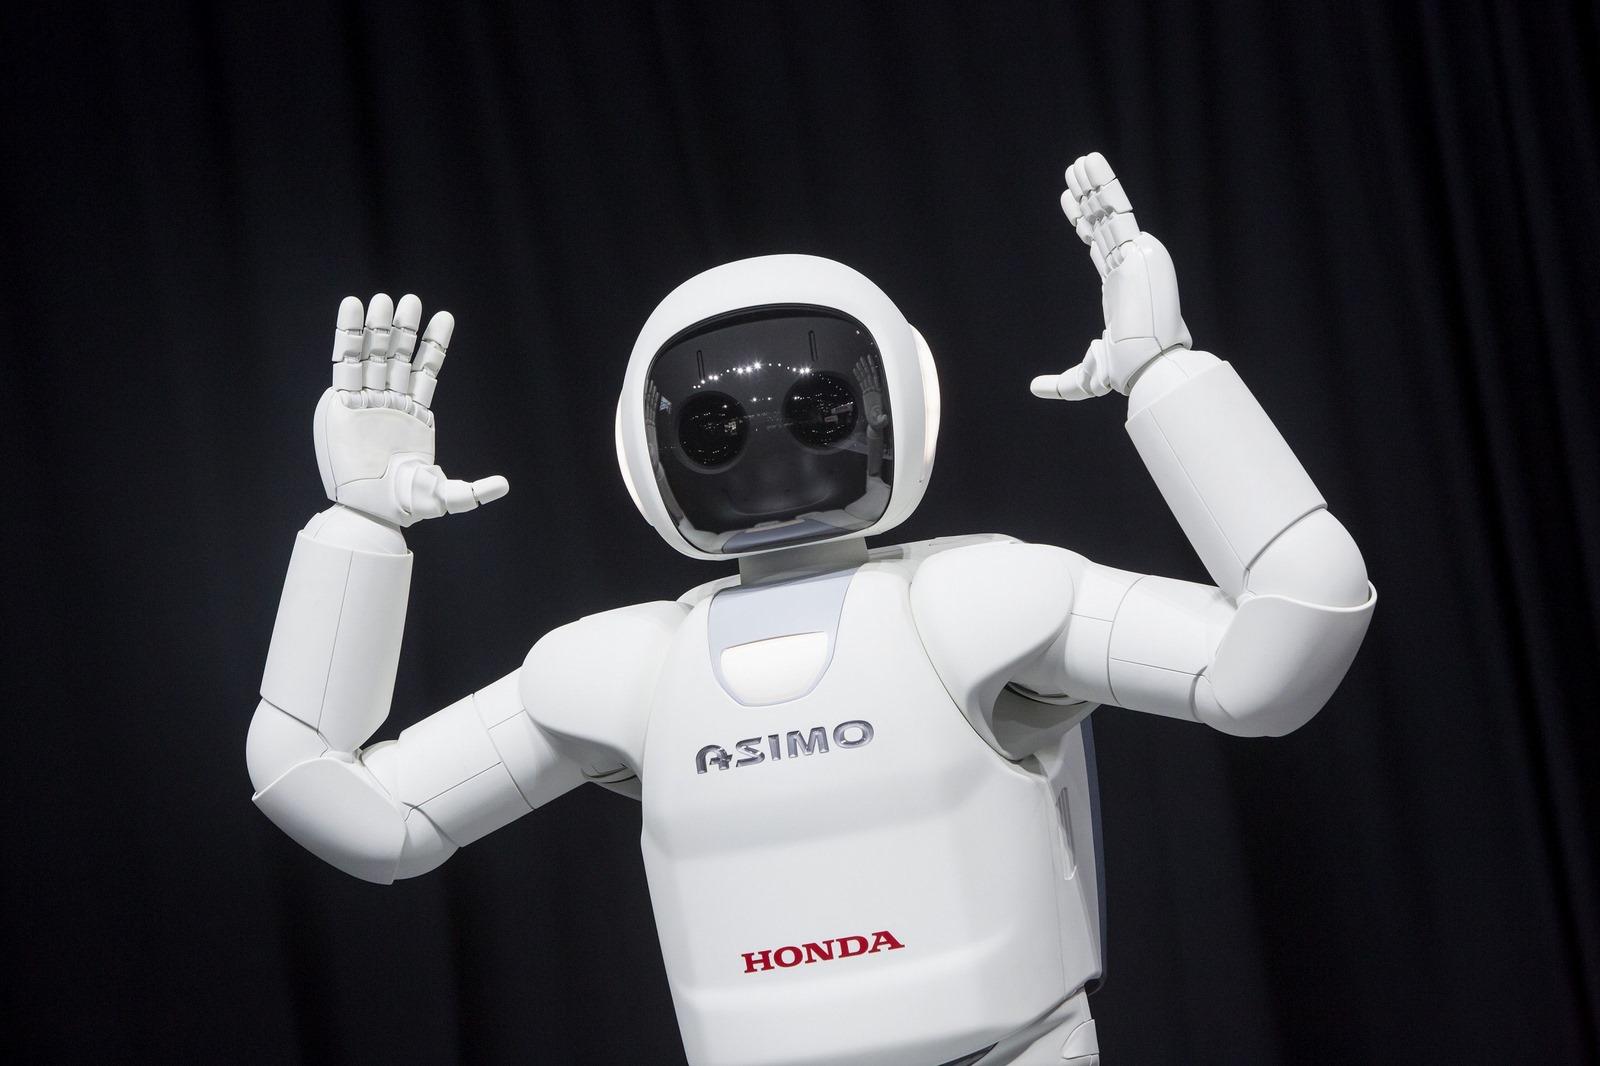 bitkoinų robotas